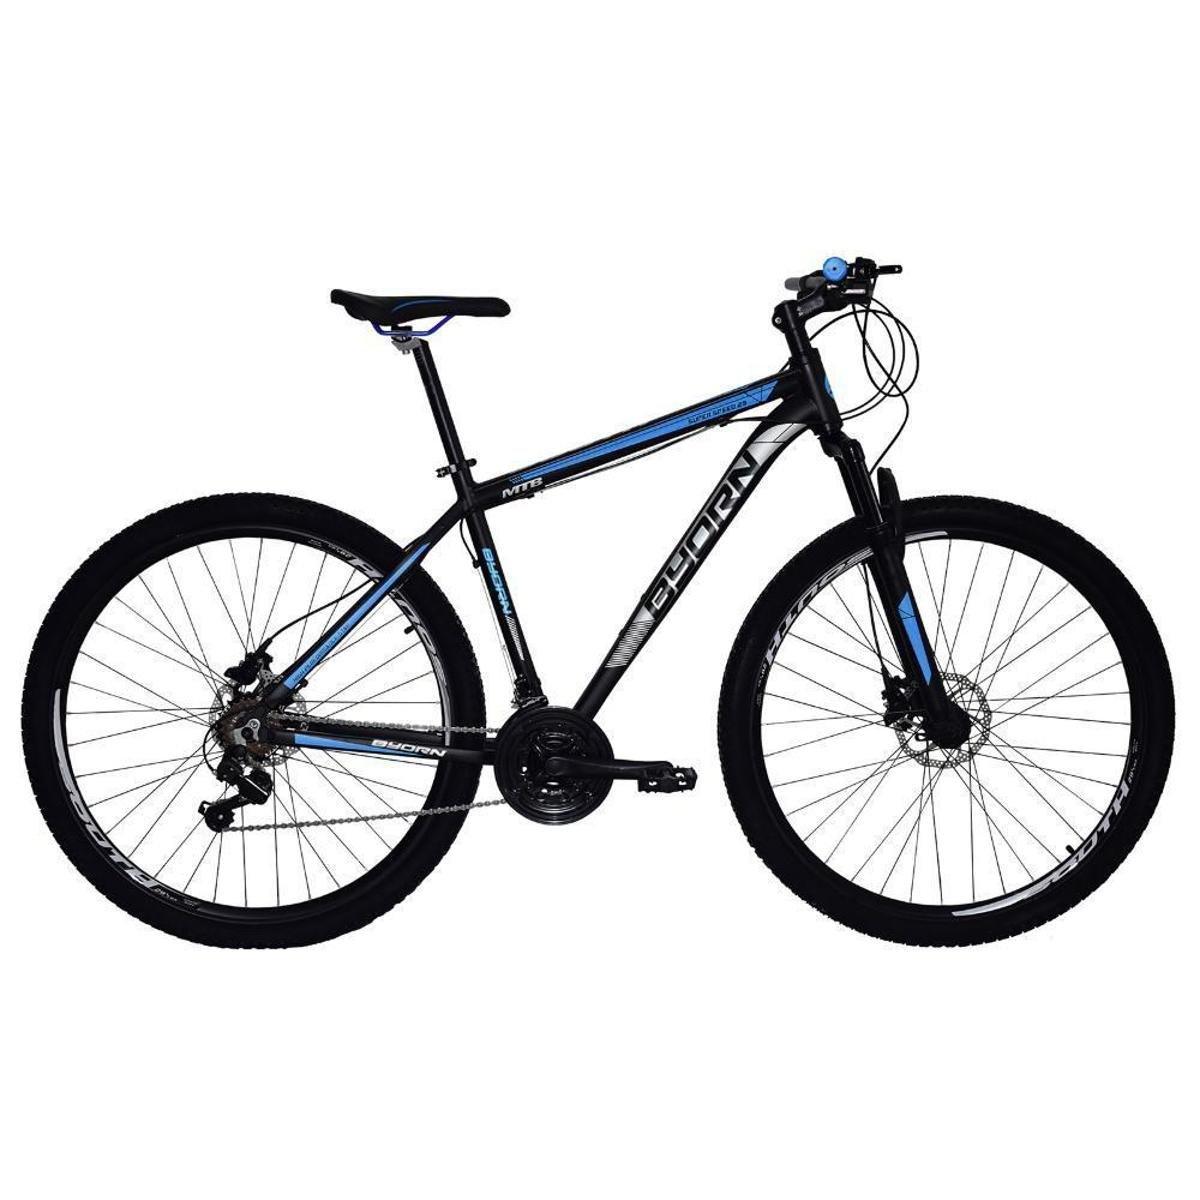 Bicicleta Byorn Extreme